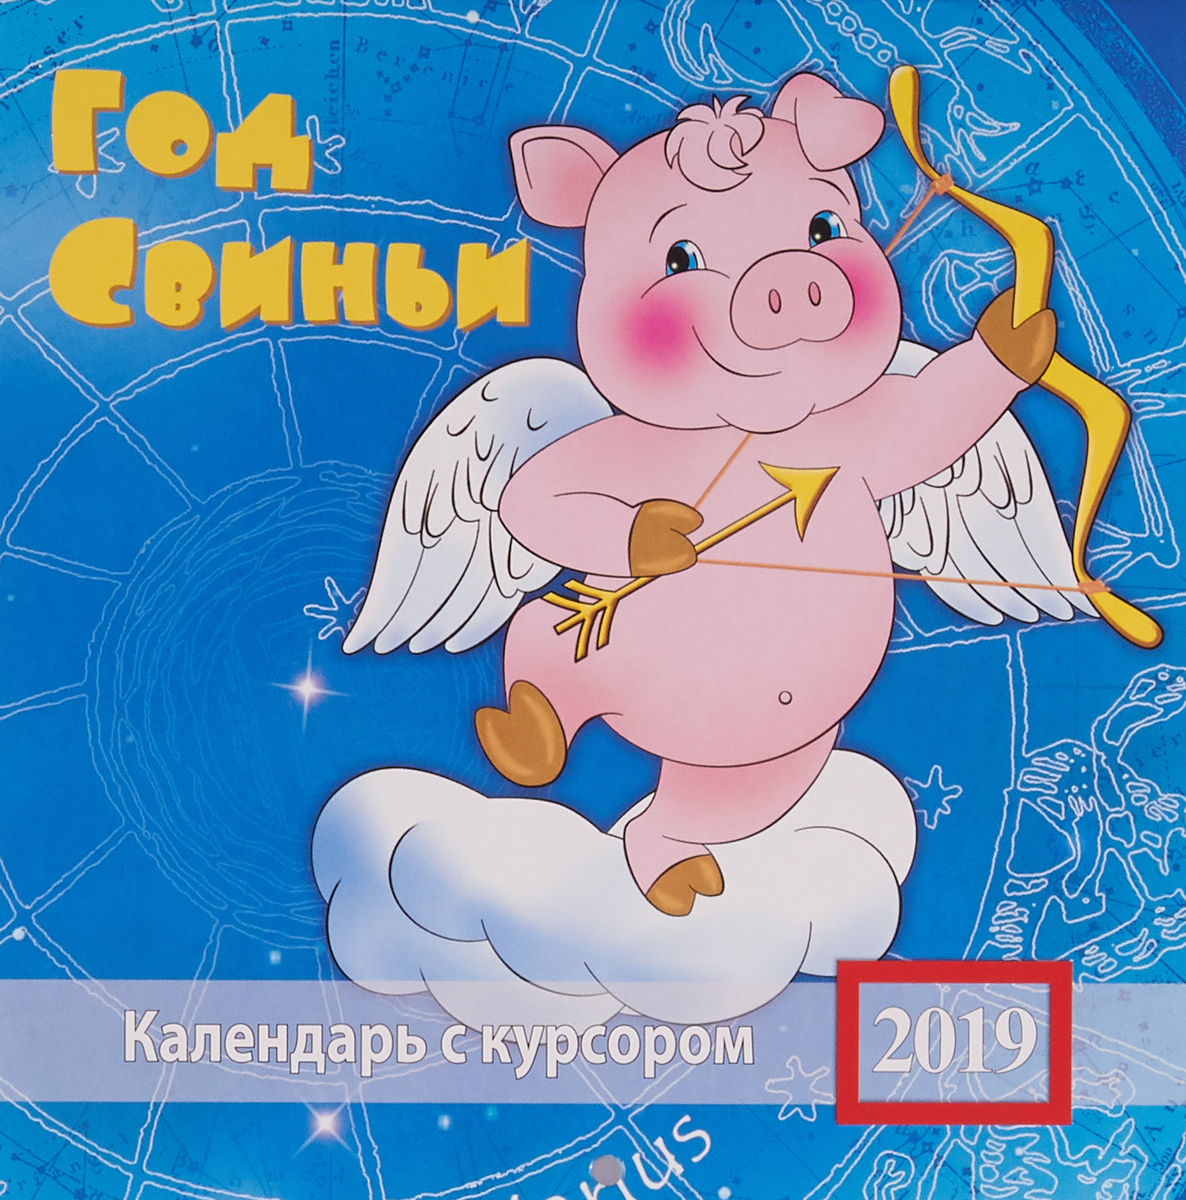 Календарь на скрепке с курсором на 2019 год. Год Свиньи гороскоп